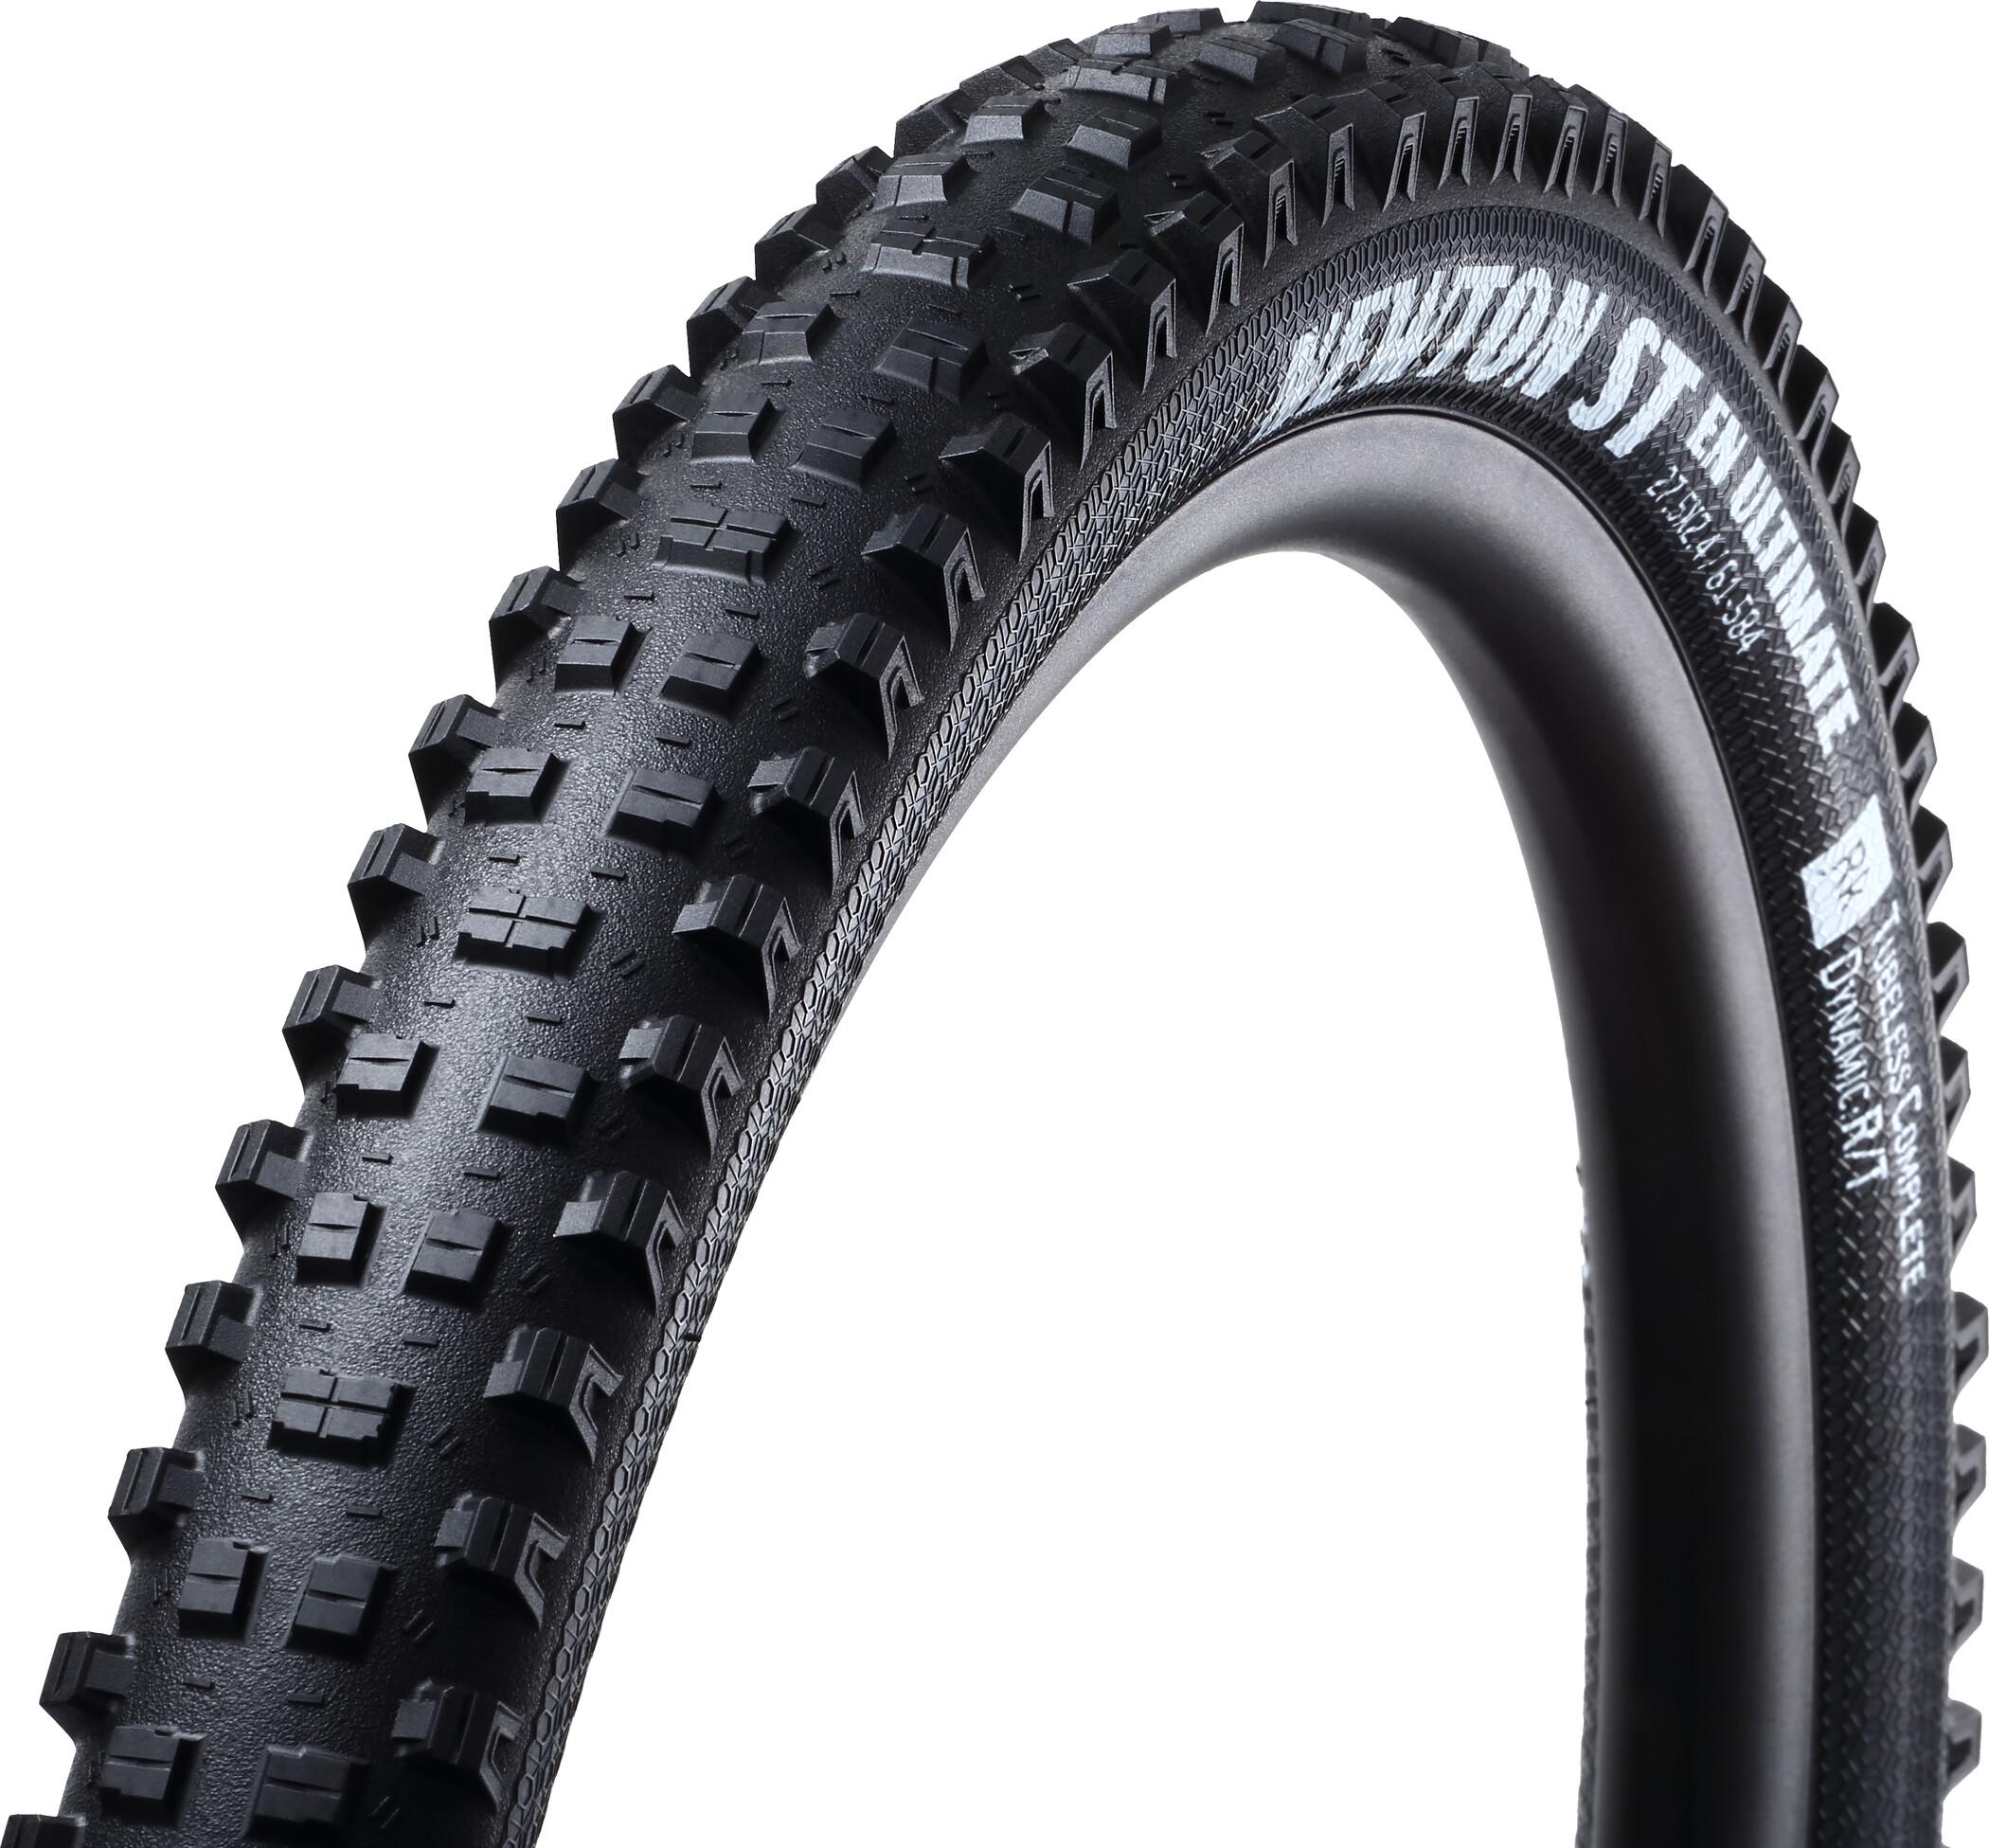 Goodyear Newton-ST EN Ultimate Foldedæk 66-584 Tubeless Complete Dynamic R/T e25, black (2019)   Tyres